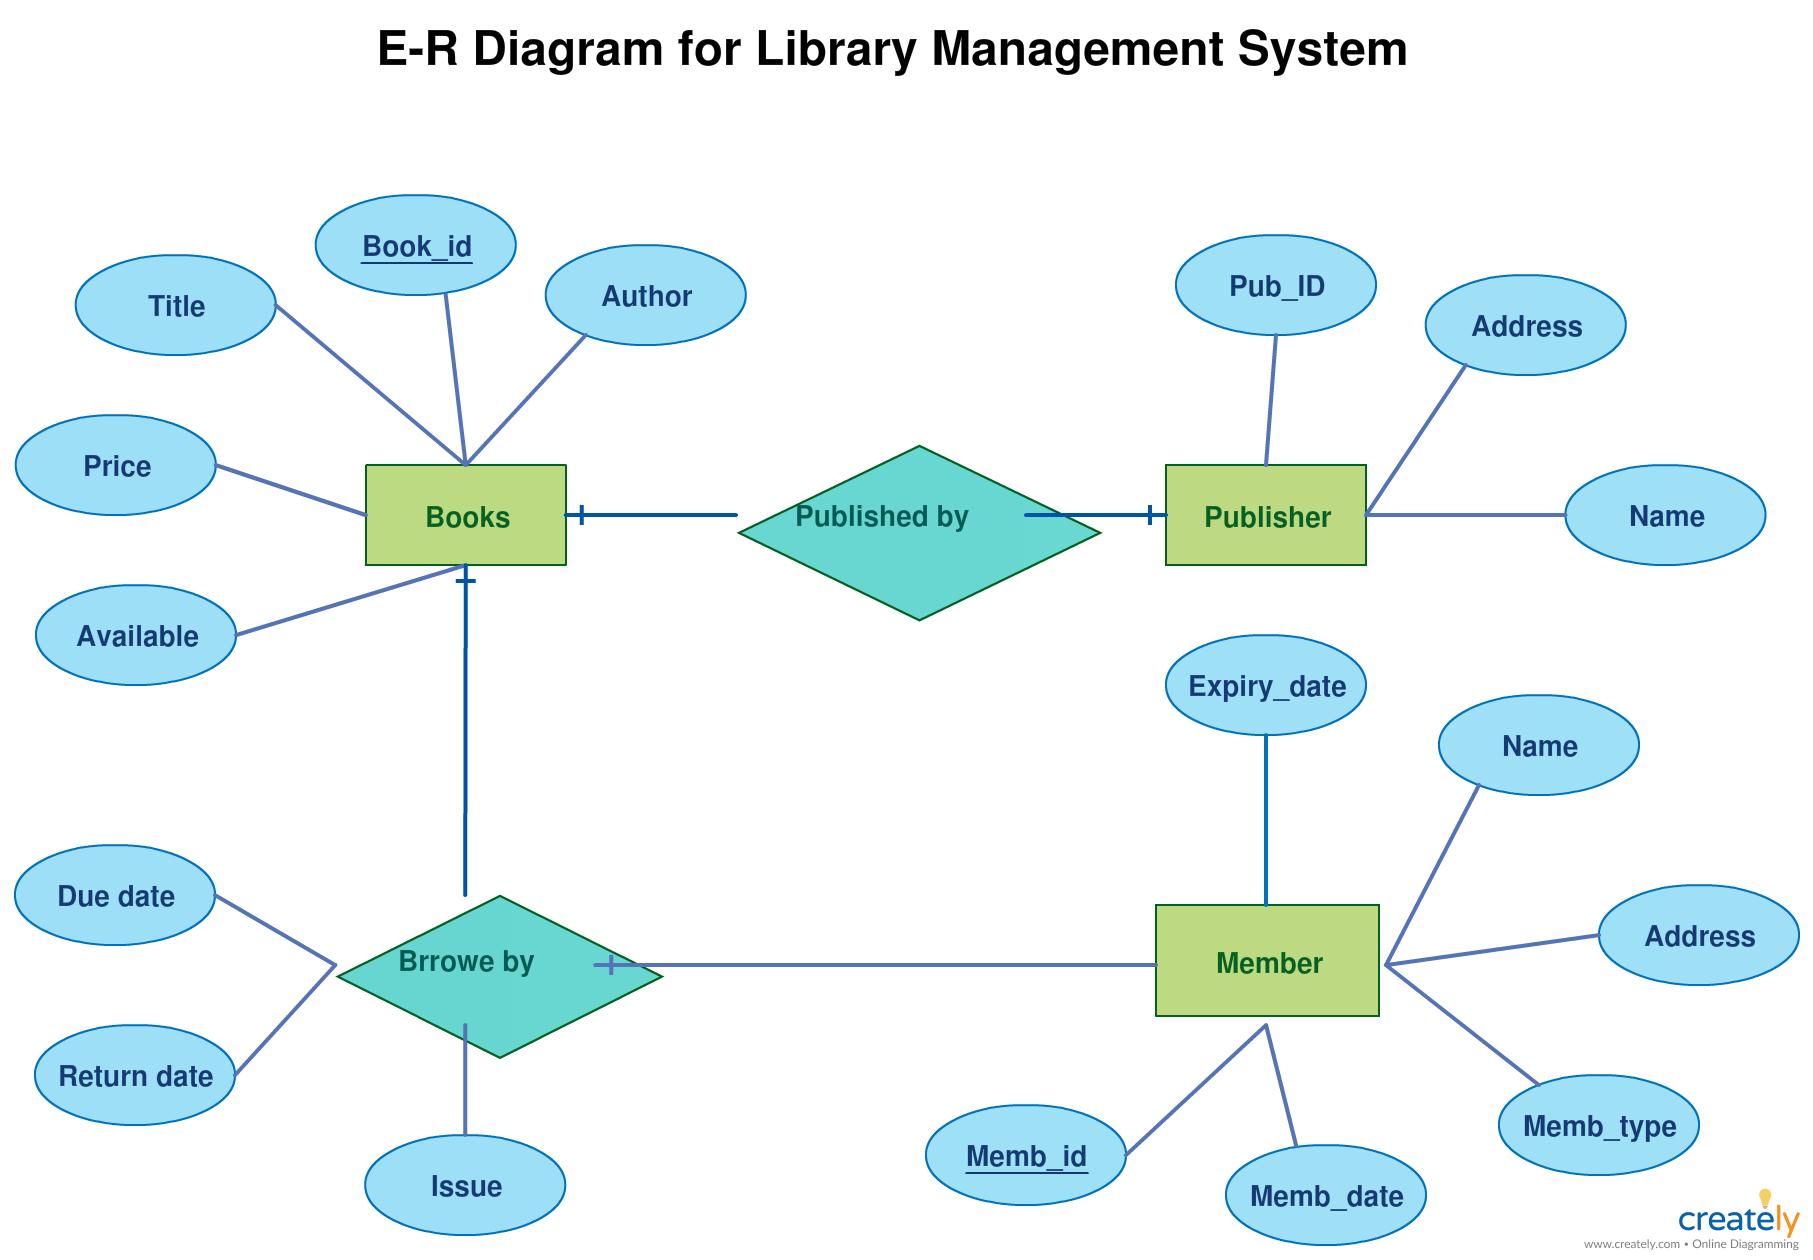 Er Diagram Tutorial | Complete Guide To Entity Relationship inside Er Diagram Examples For School Management